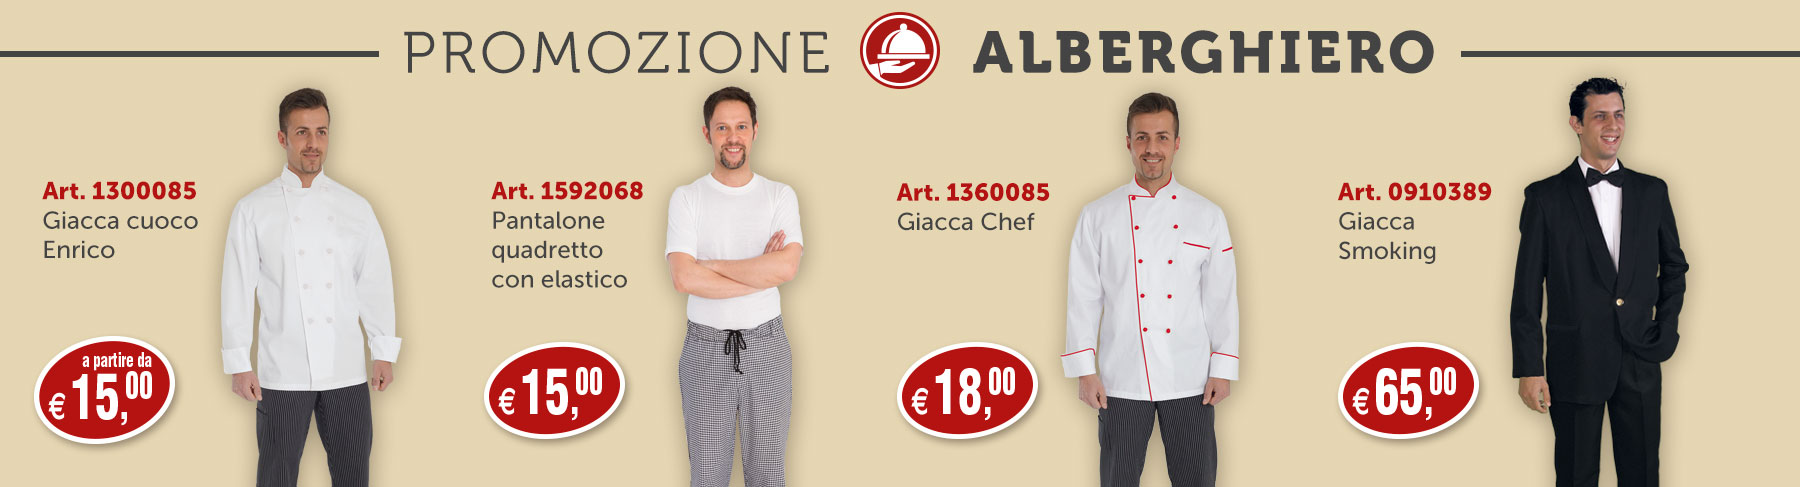 slide_promo_alberghiero